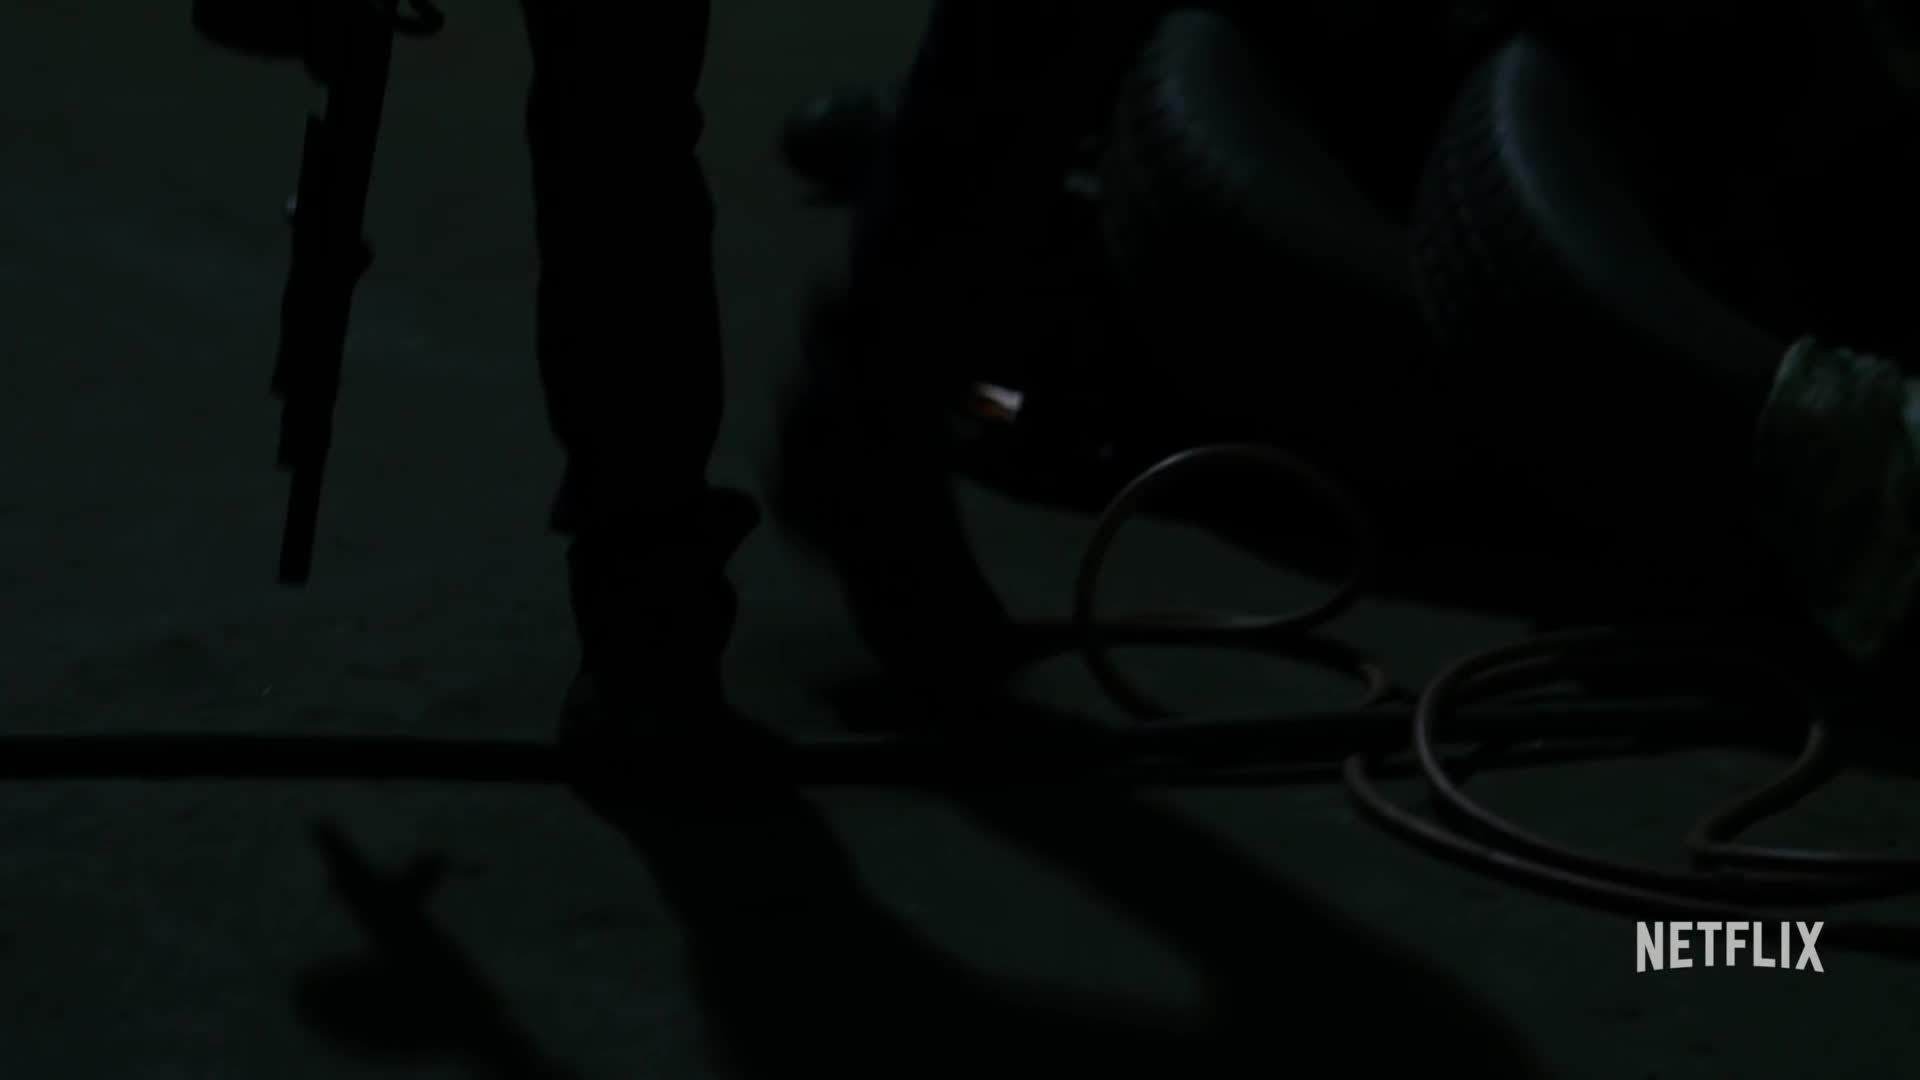 charlie cox, daredevil, frank castle, jon bernthal, marvel, marvel cinematic universe, matt murdock, mcu, netflix, punisher, the punisher, Daredevil and The Punisher GIFs